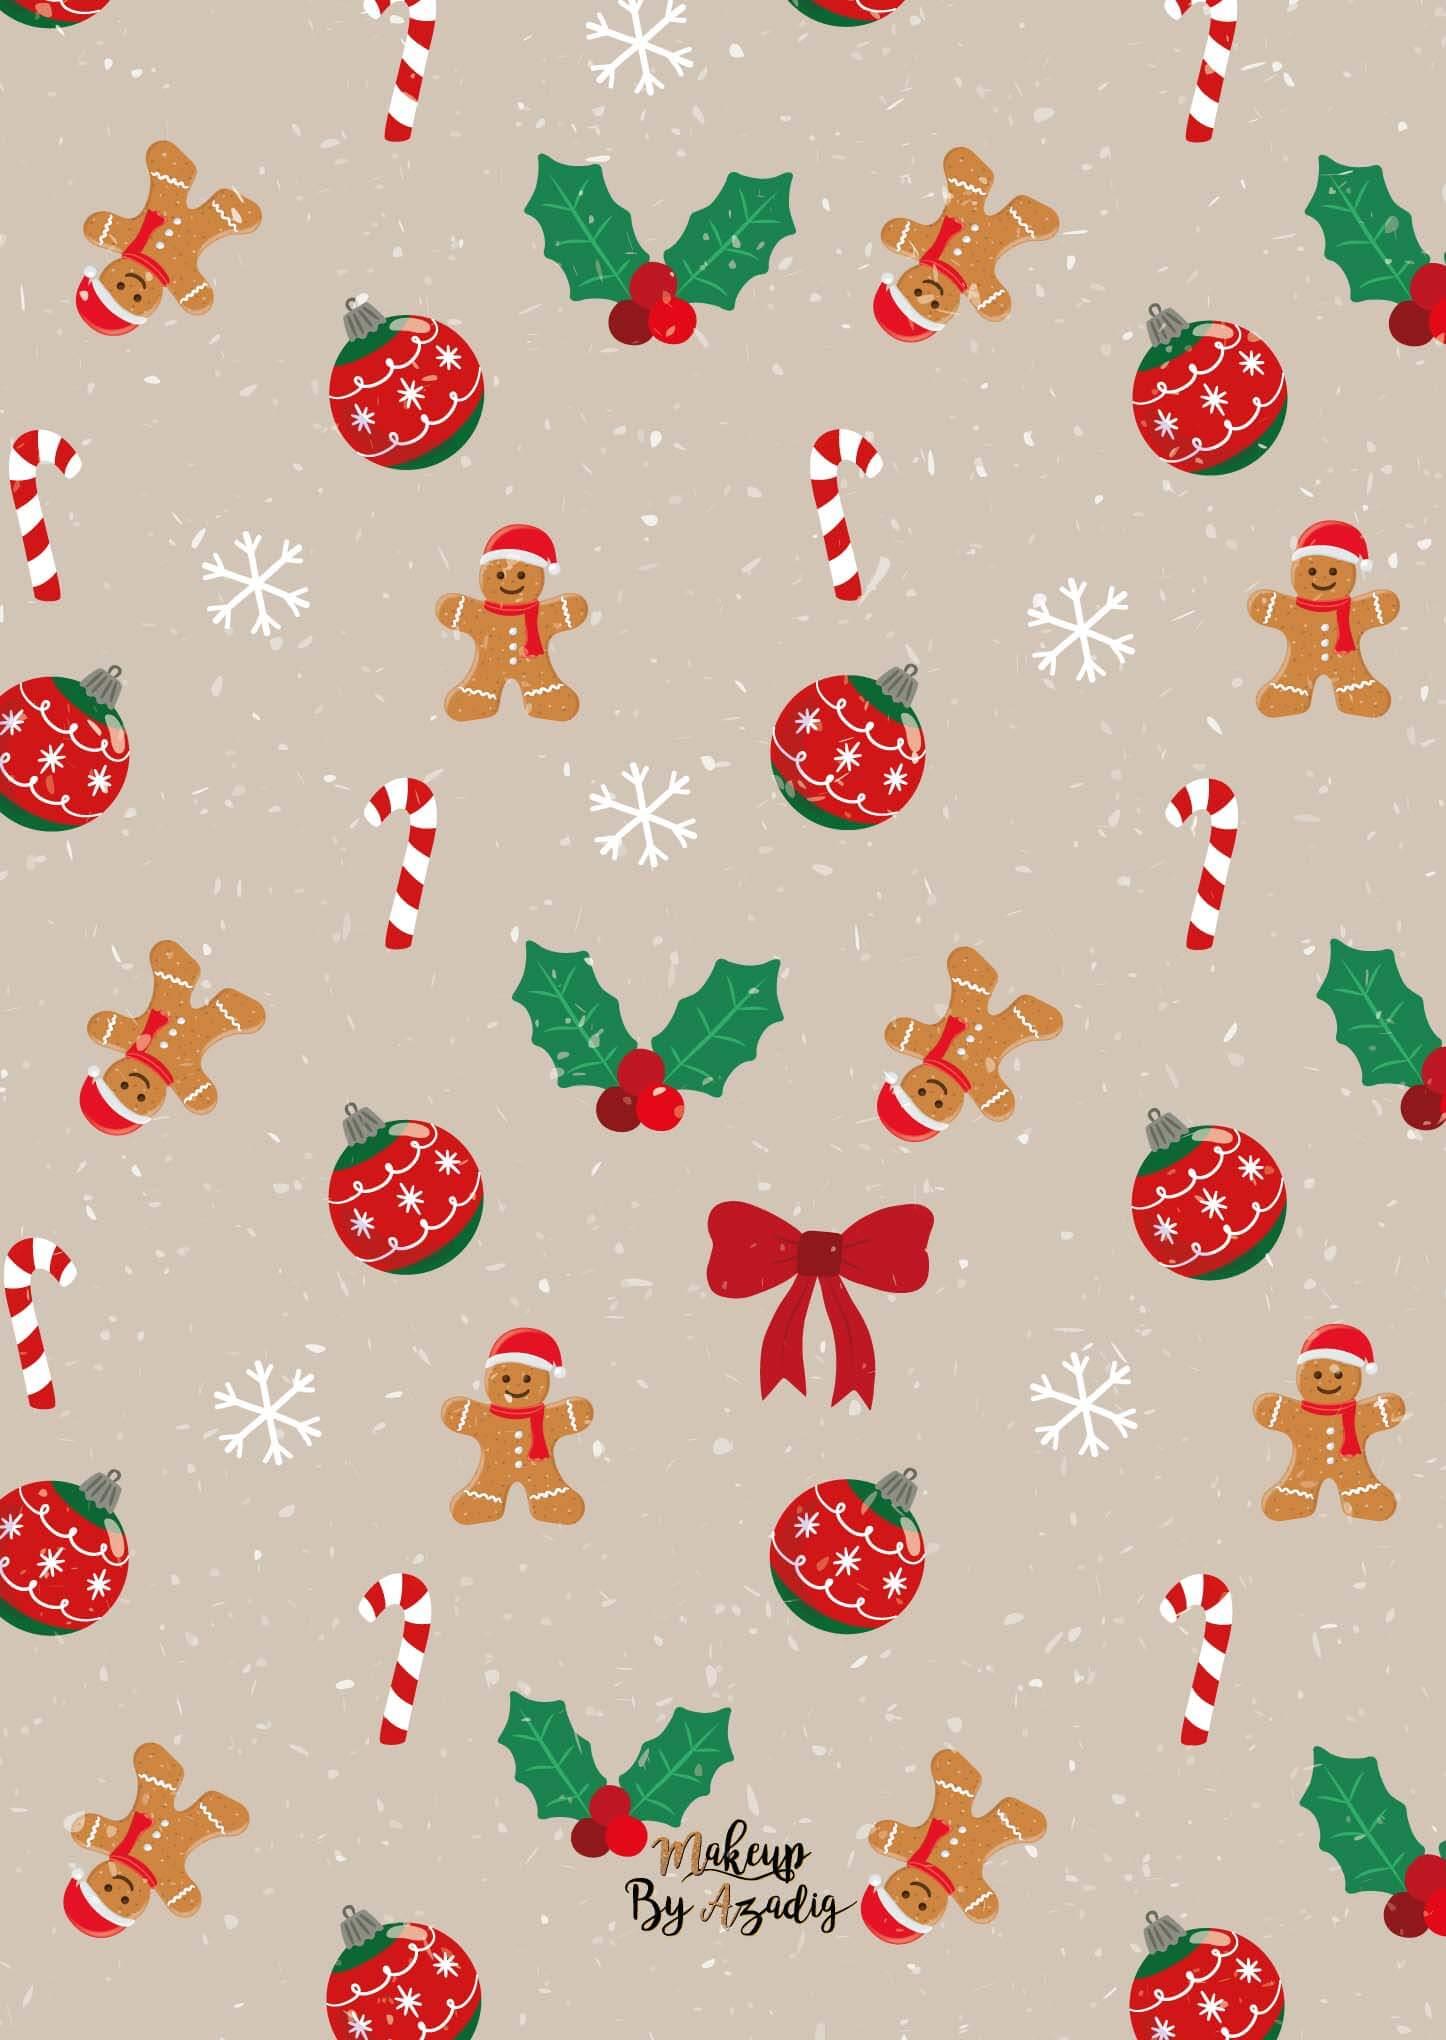 fond-decran-wallpaper-christmas-noel-elements-gingerbread-houx-decoration-december-ipad-tablette-apple-makeupbyazadig-tendance